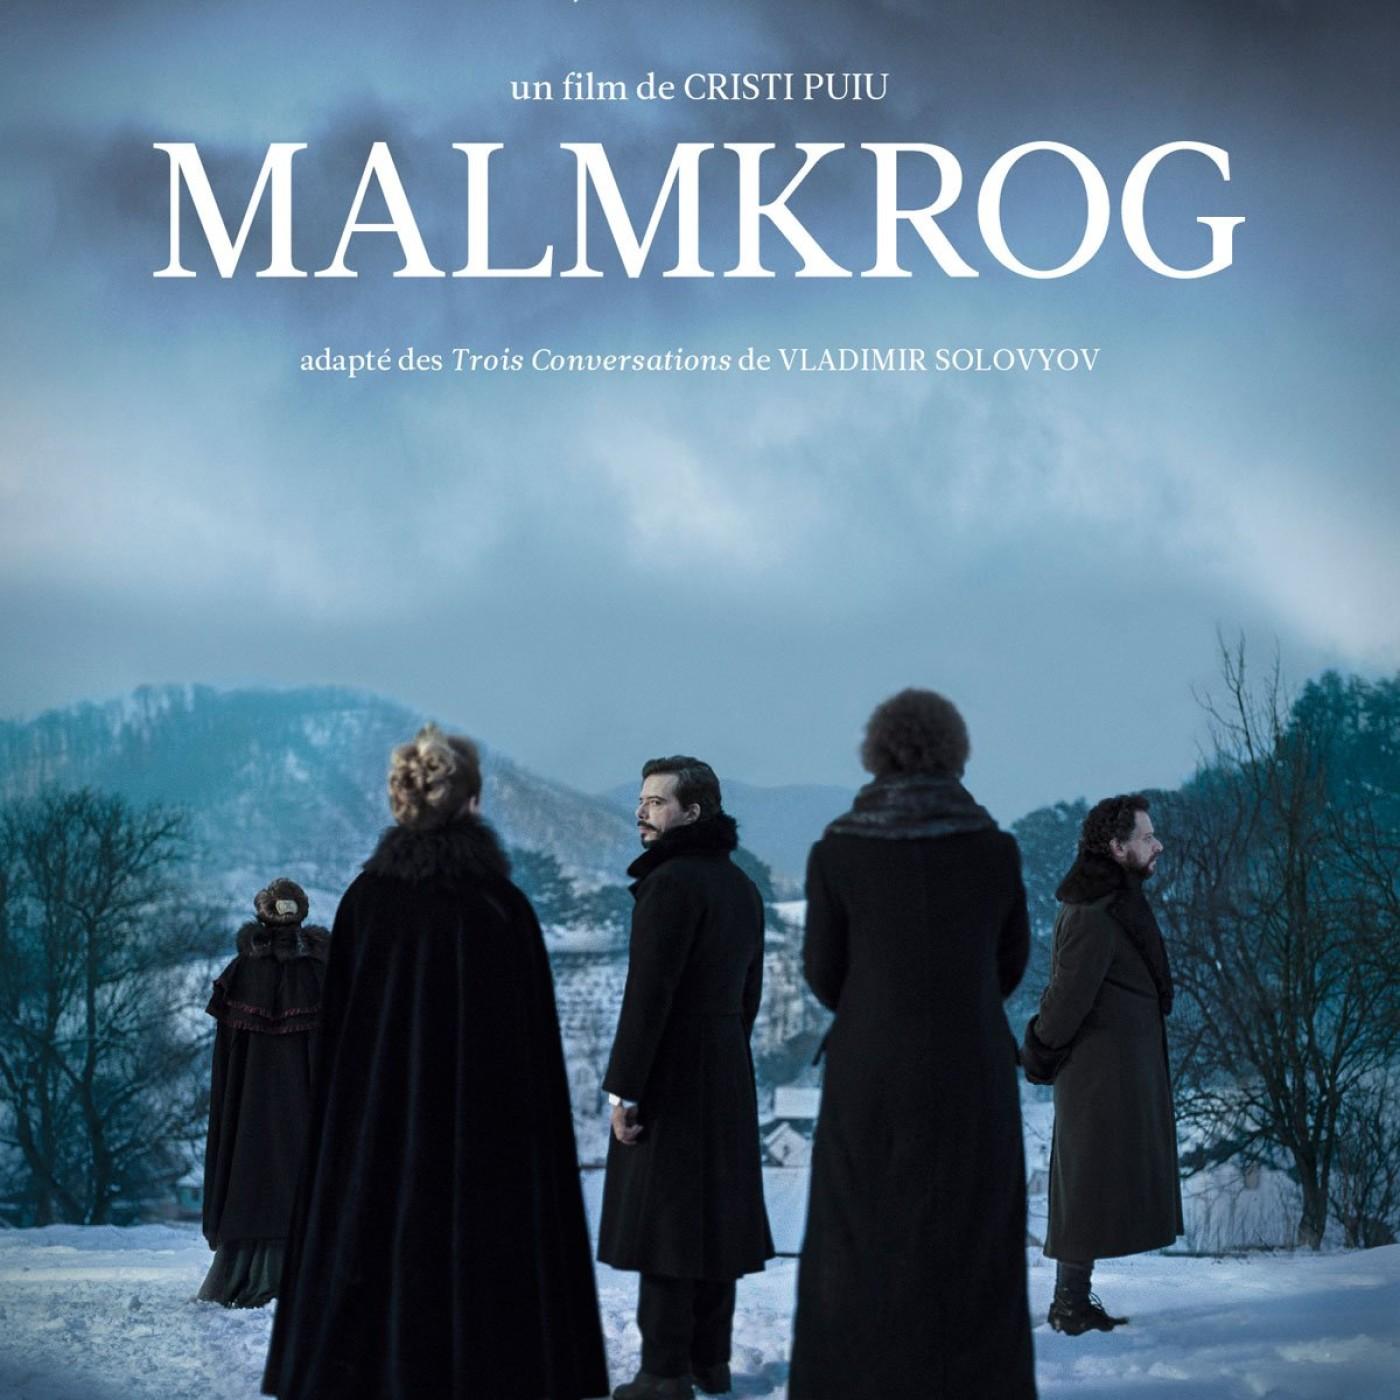 Critique du Film MALMKROG